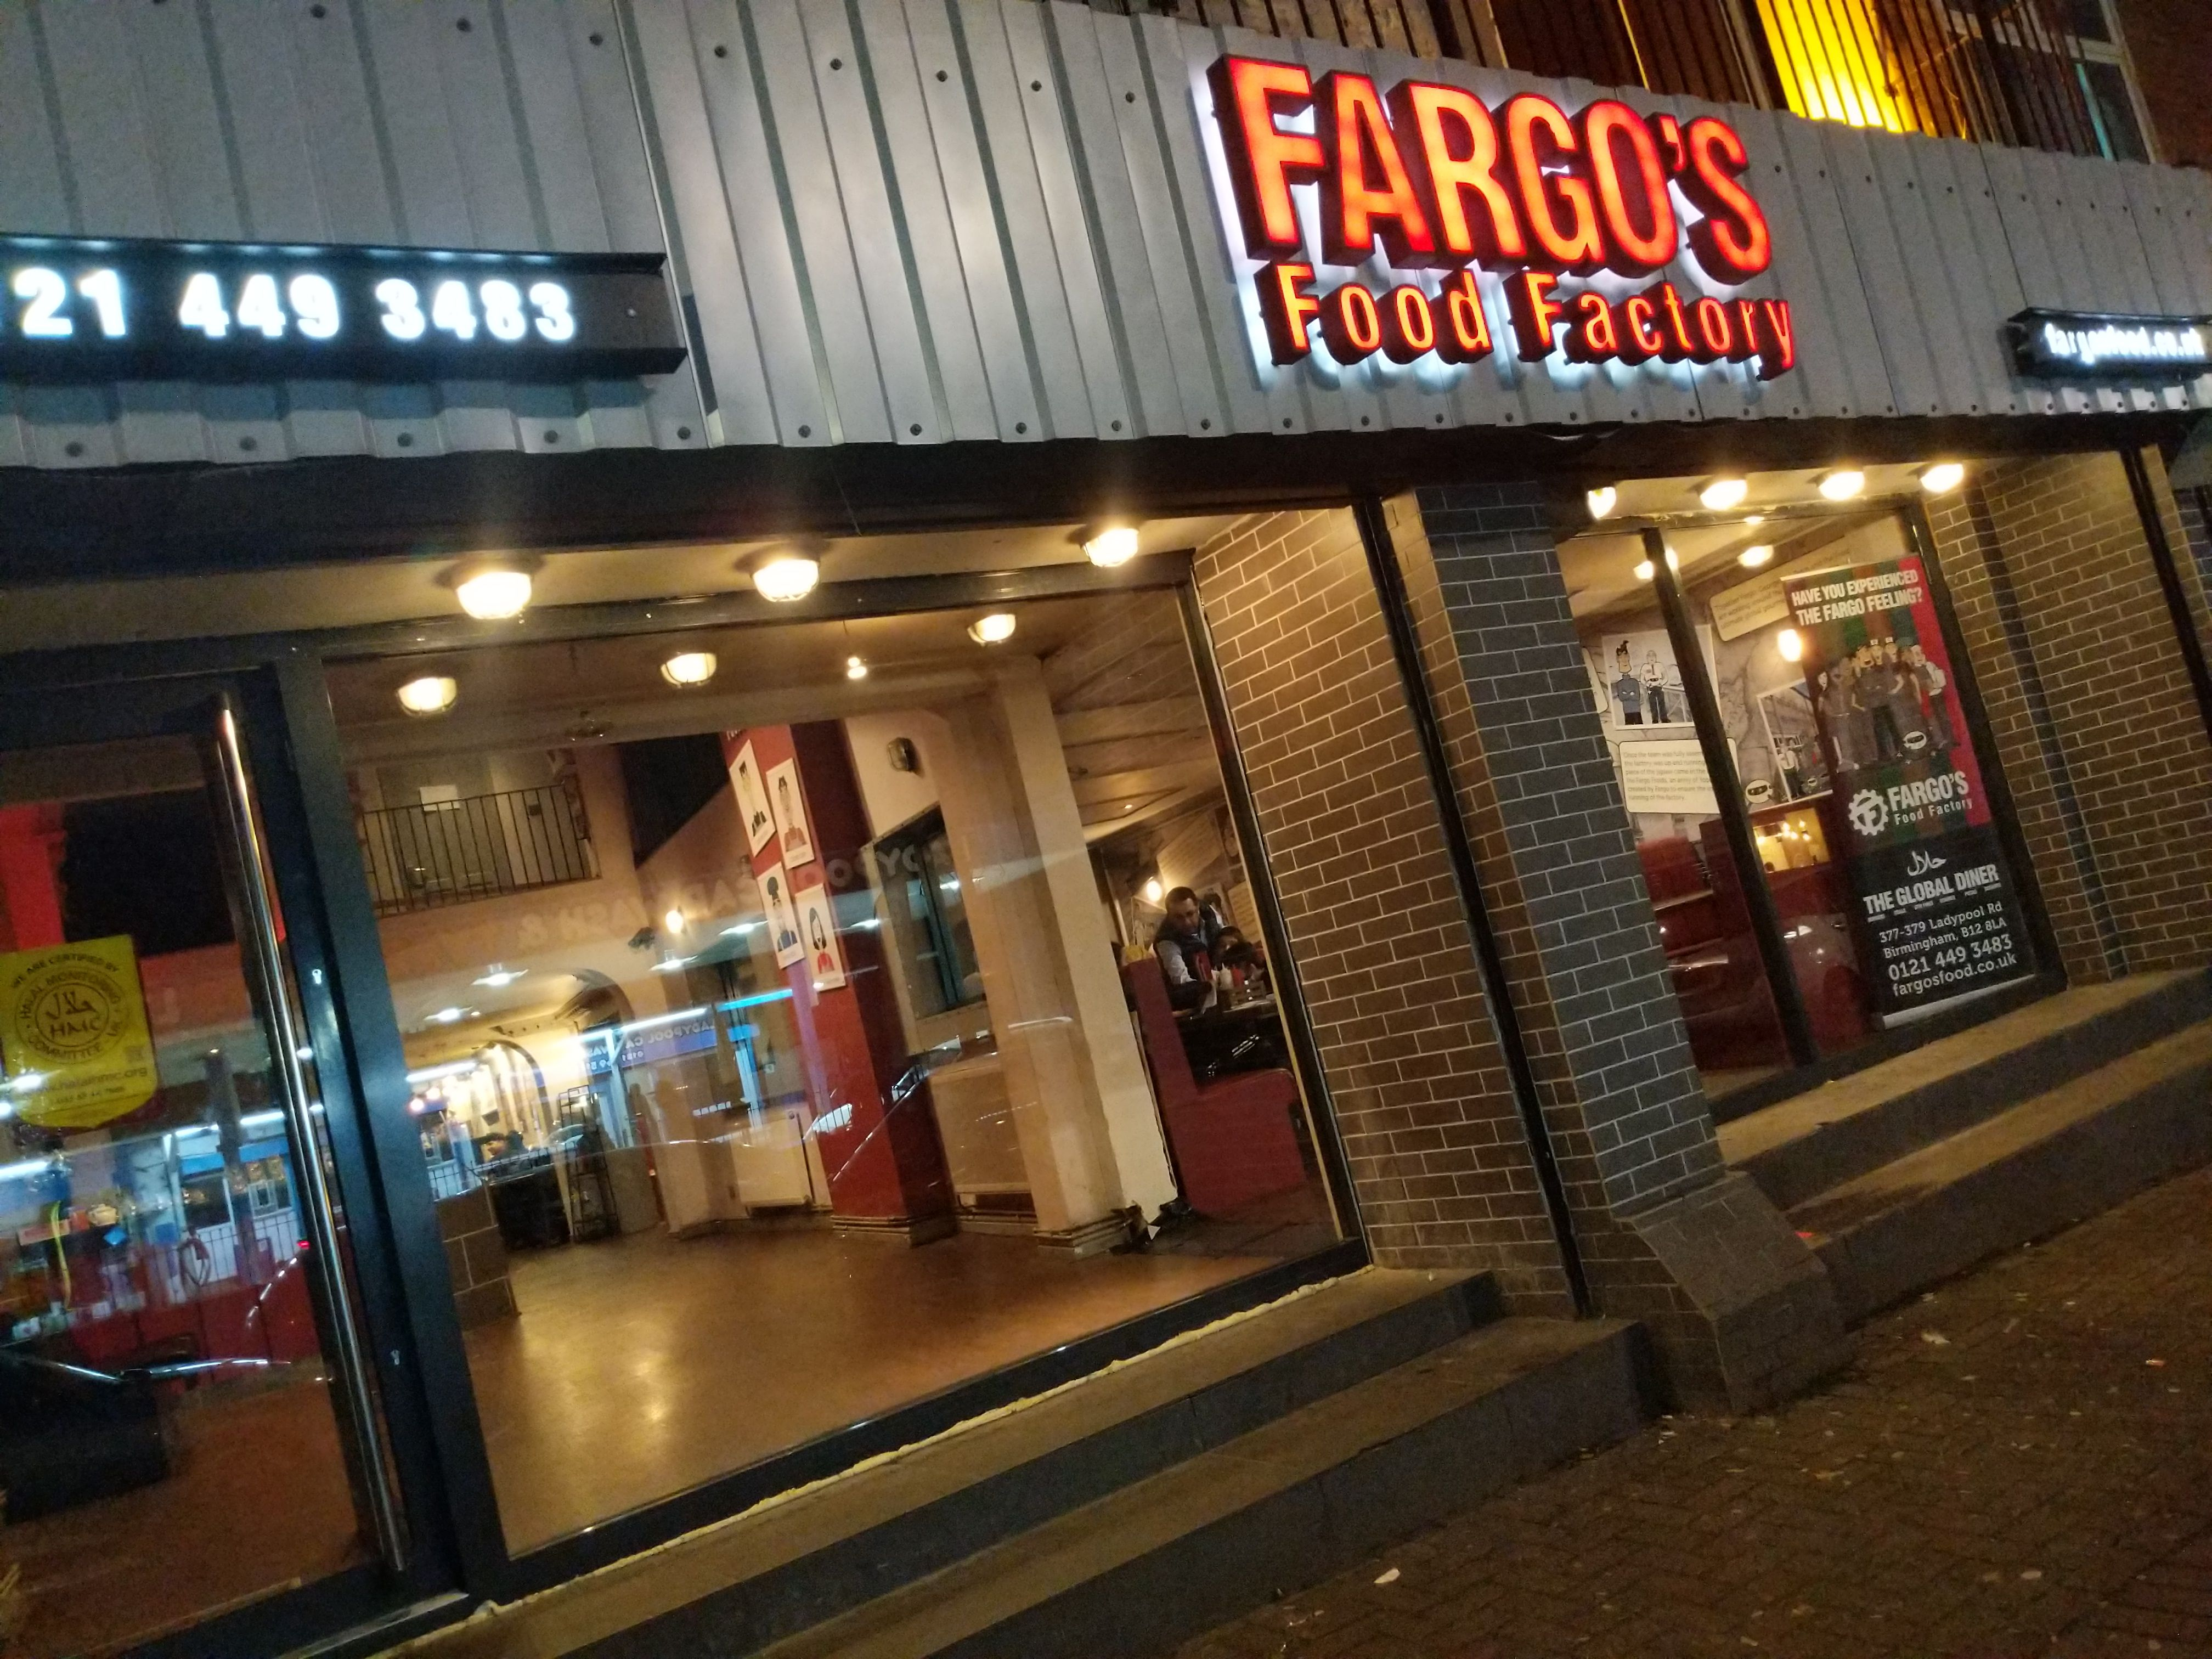 Fargo S Food Factory Birmingham Review Halal Tapas Menu With A Range Of Burgers Steaks Burritos Pizza More Tapas Menu Halal Recipes Pizza And More